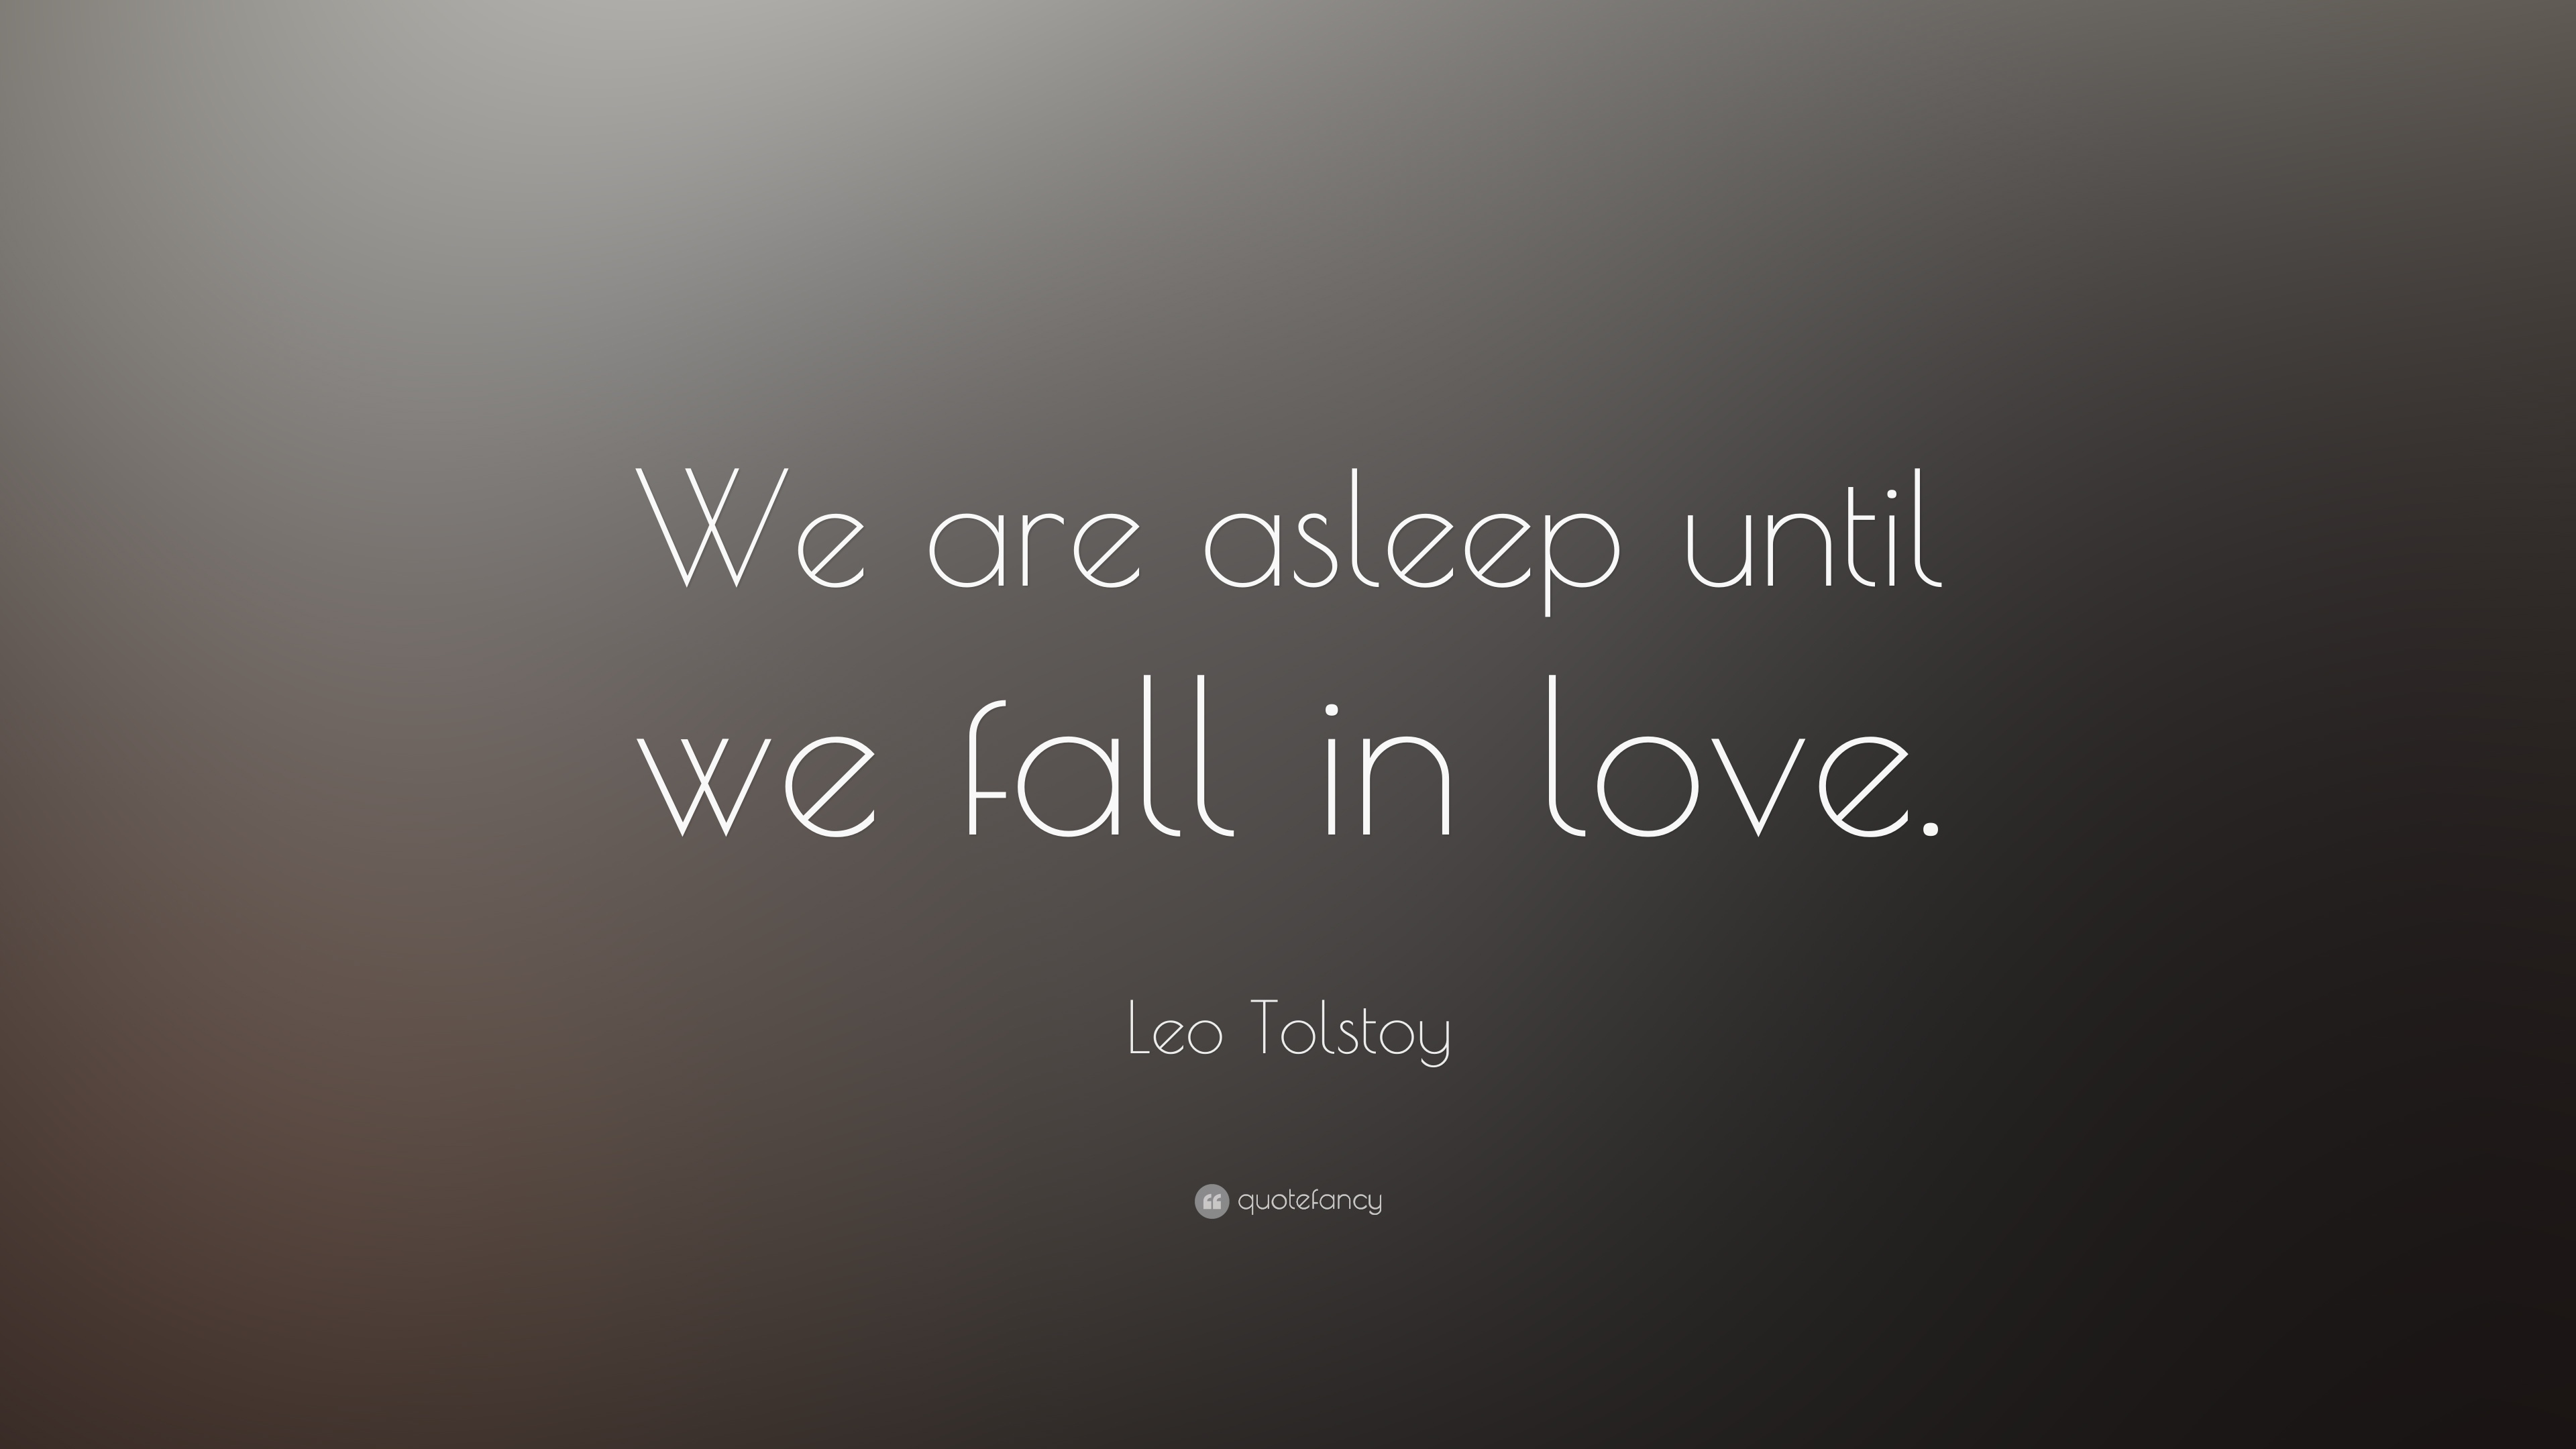 leo tolstoy quotes 100 wallpapers quotefancy